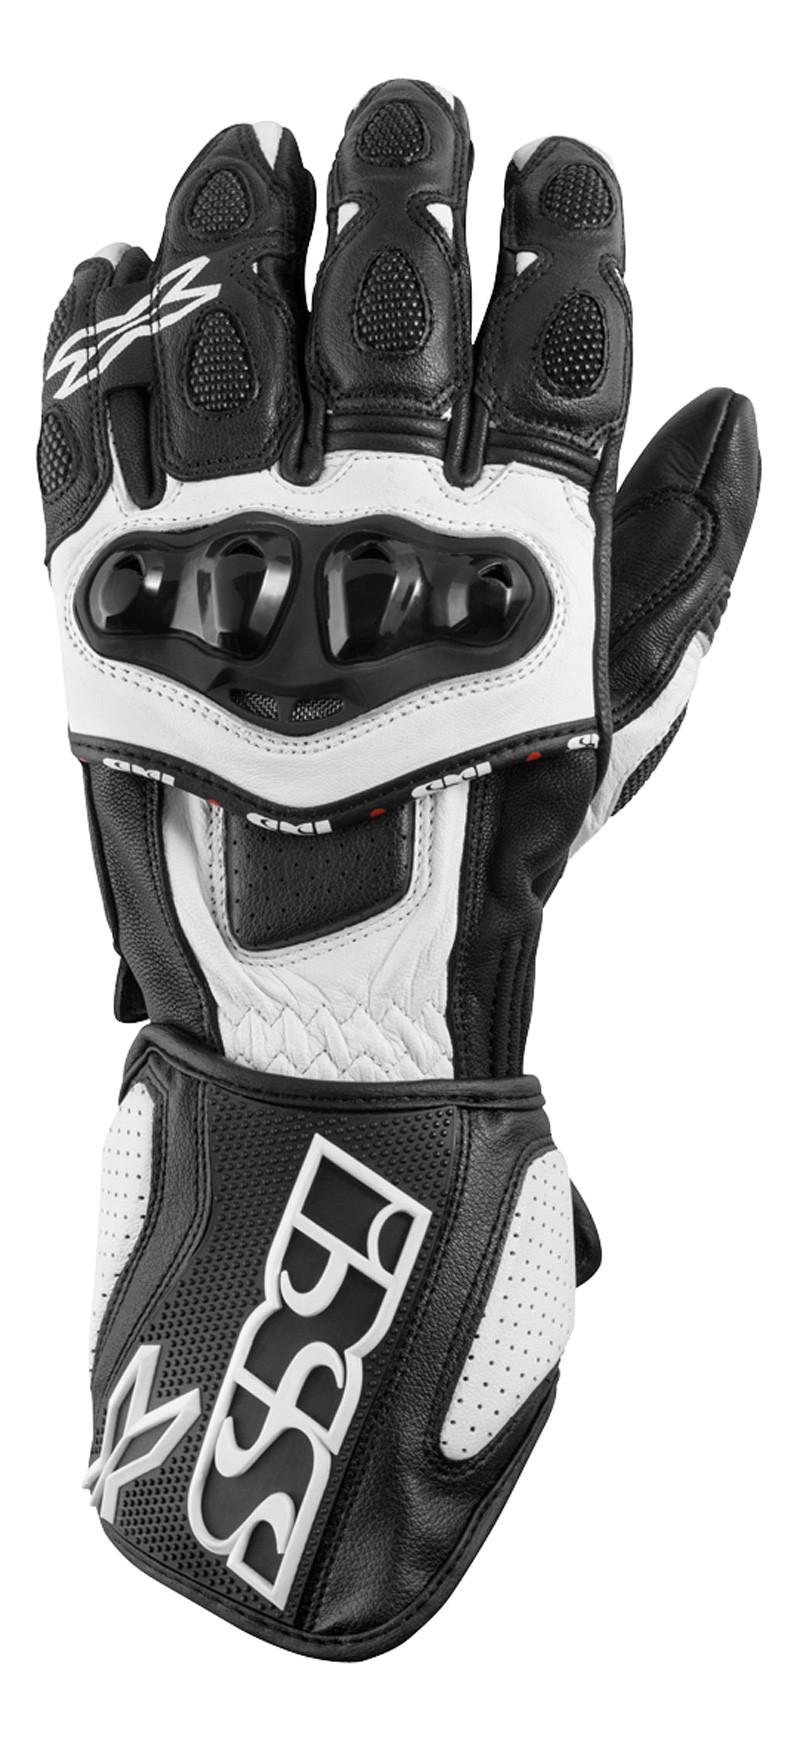 IXS gants Sport LD RS-300  noir-blanc